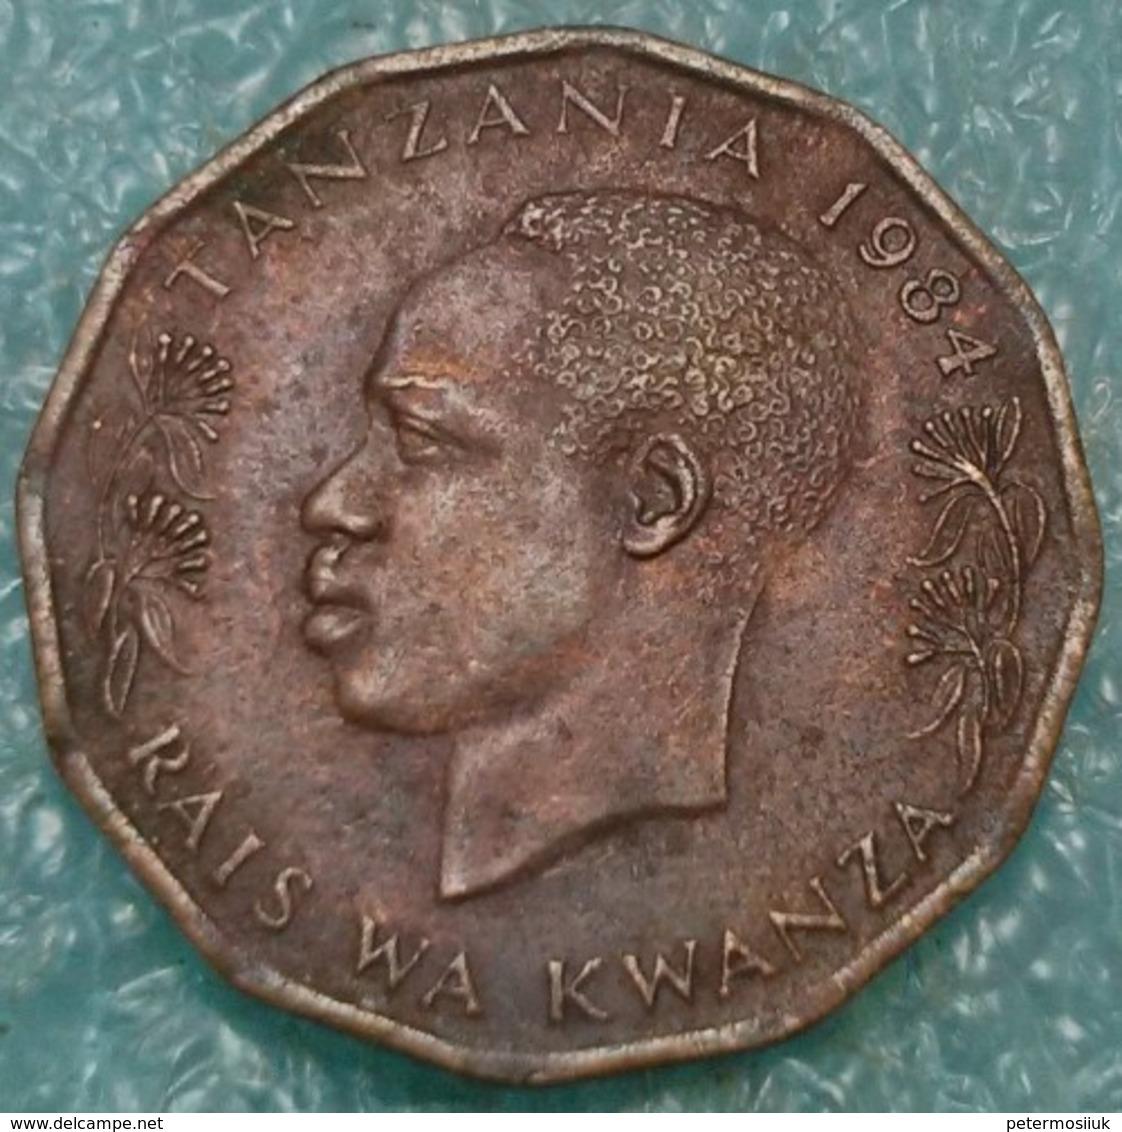 Tanzania 5 Senti, 1984 -4517 - Tanzania